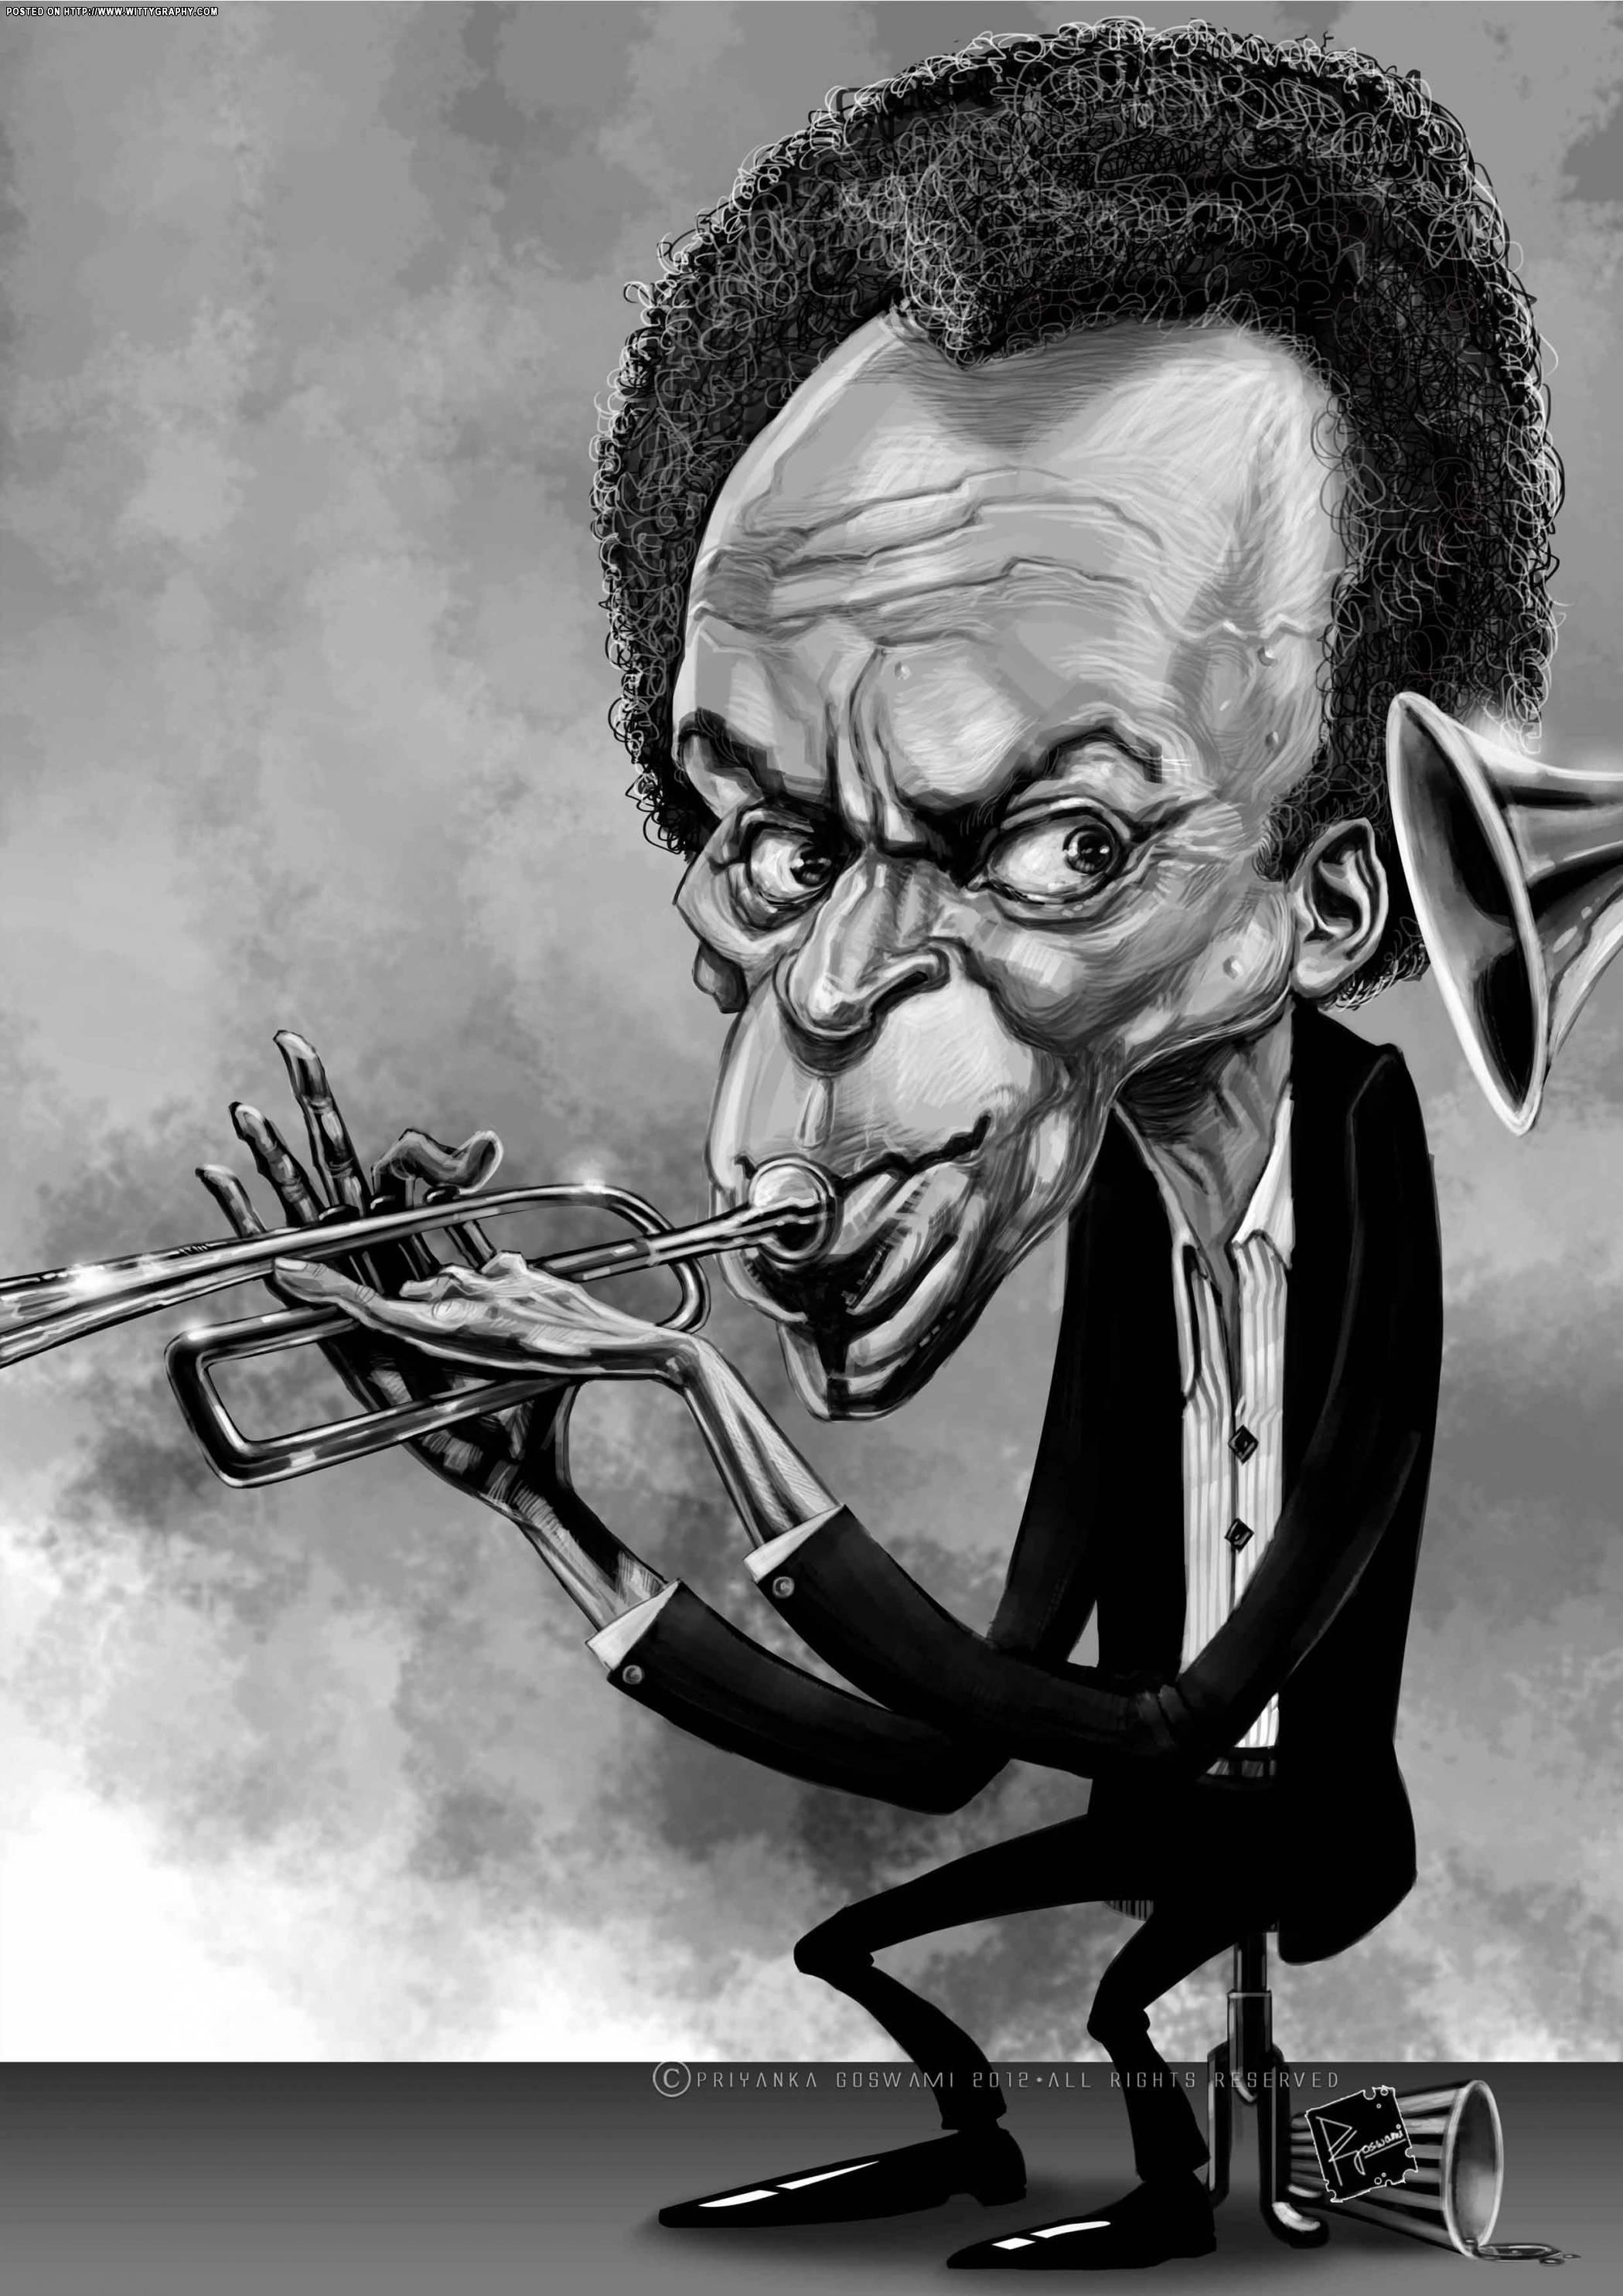 miles davis caricatures2 caricature jazz art